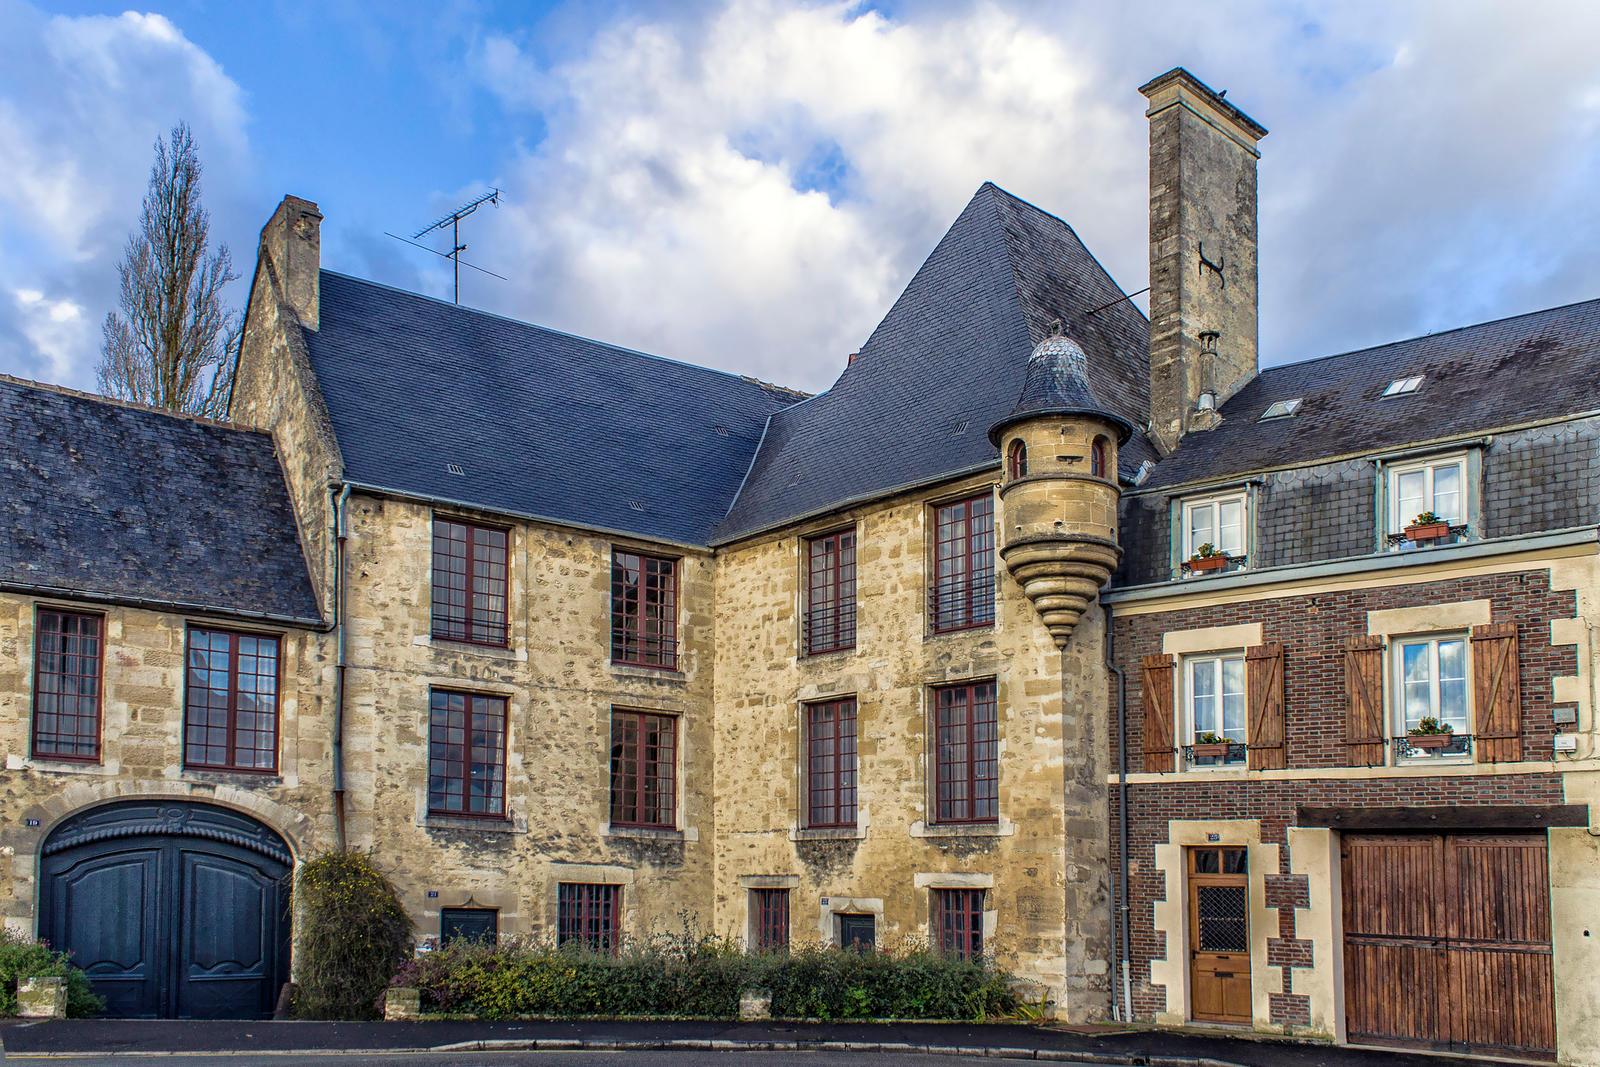 house1 argentan Orne France by hubert61